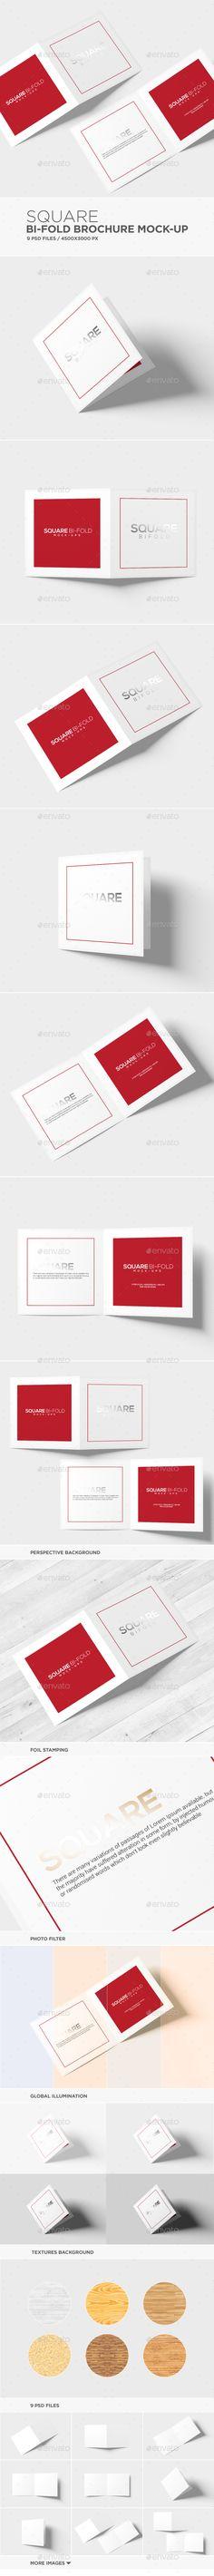 Square Bi-fold Brochure Mock-Up Design Template PSD. Download here: https://graphicriver.net/item/square-bifold-brochure-mockup/16936772?s_rank=27&ref=yinkira